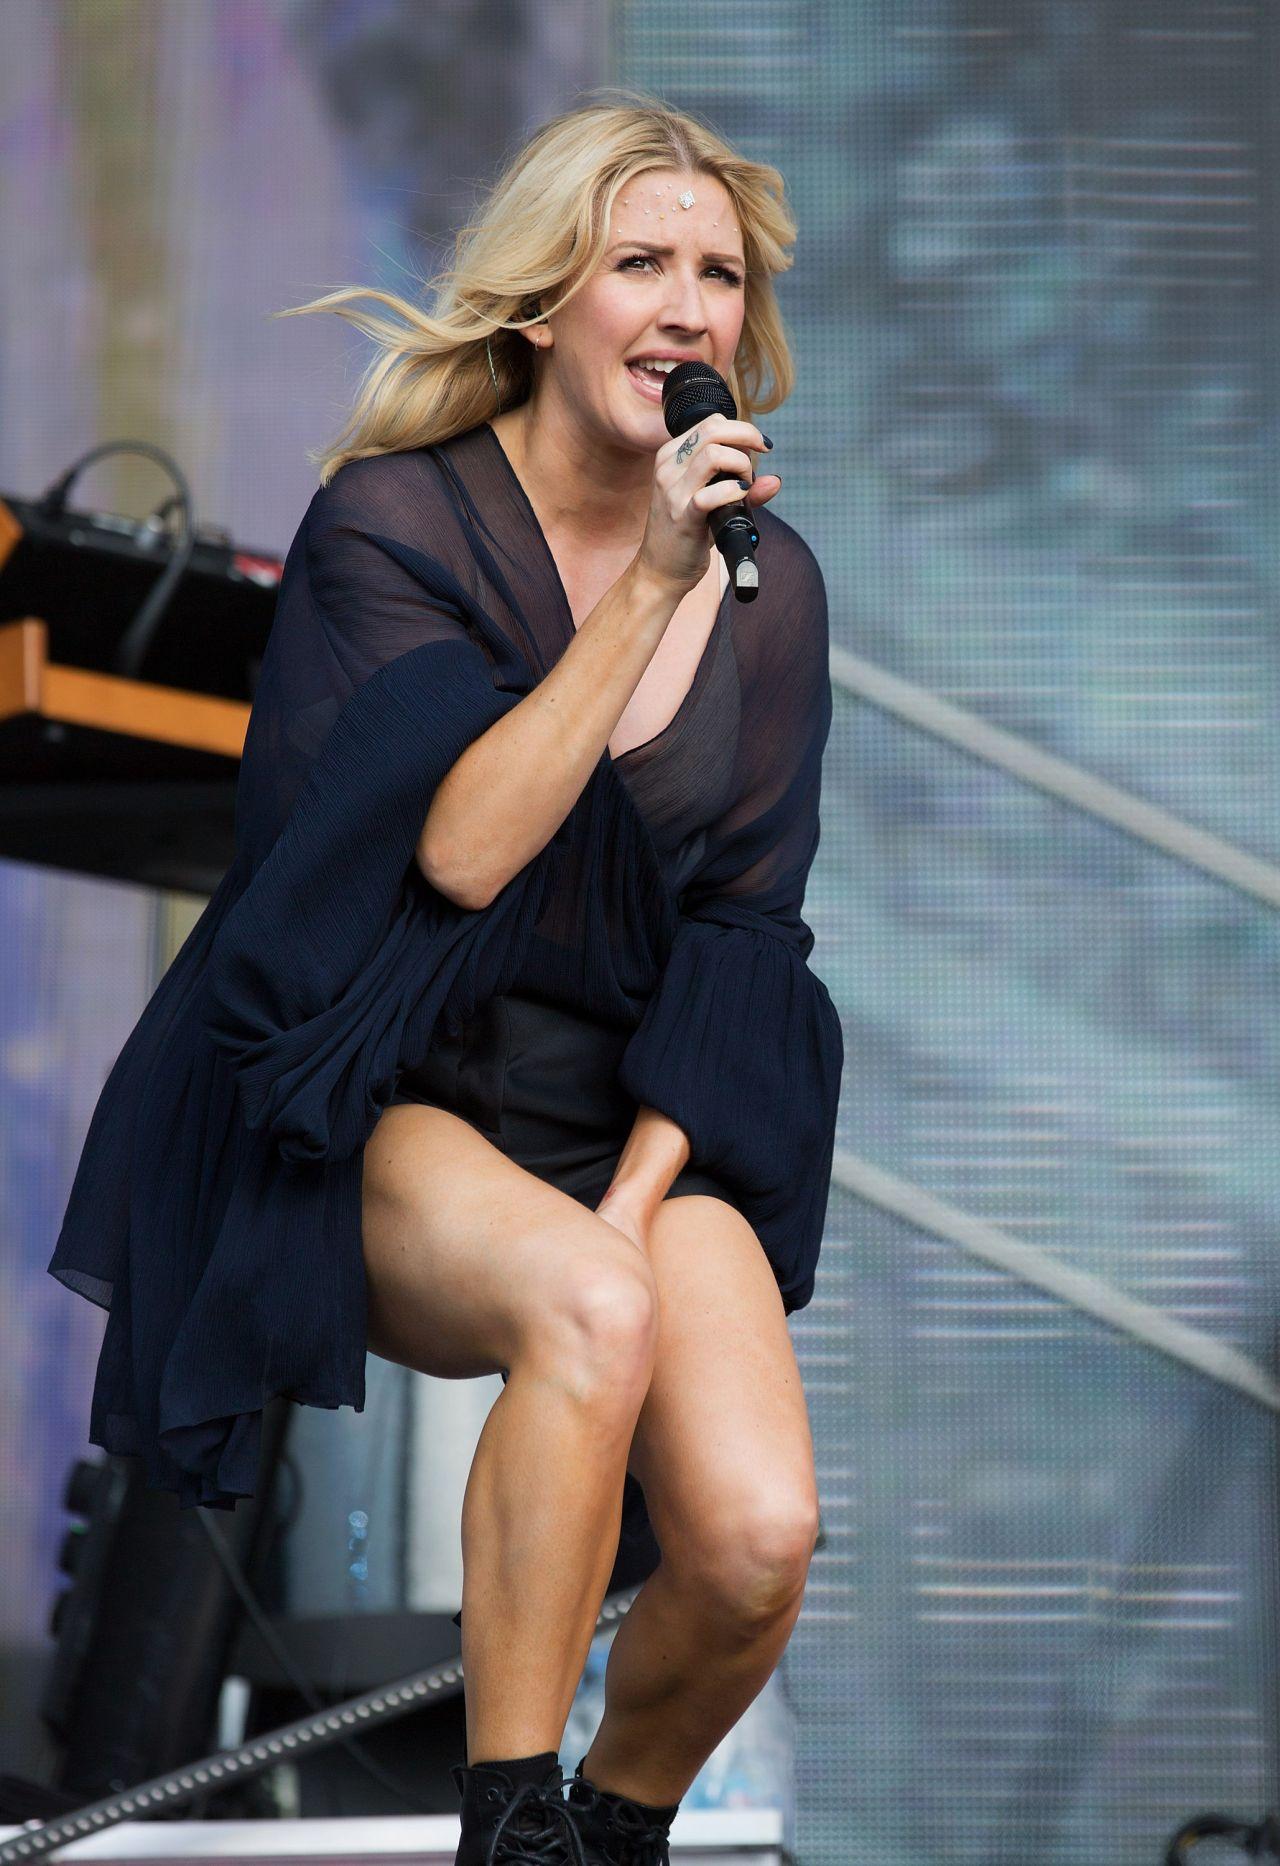 Ellie Goulding Performing at 2015 British Summer Time